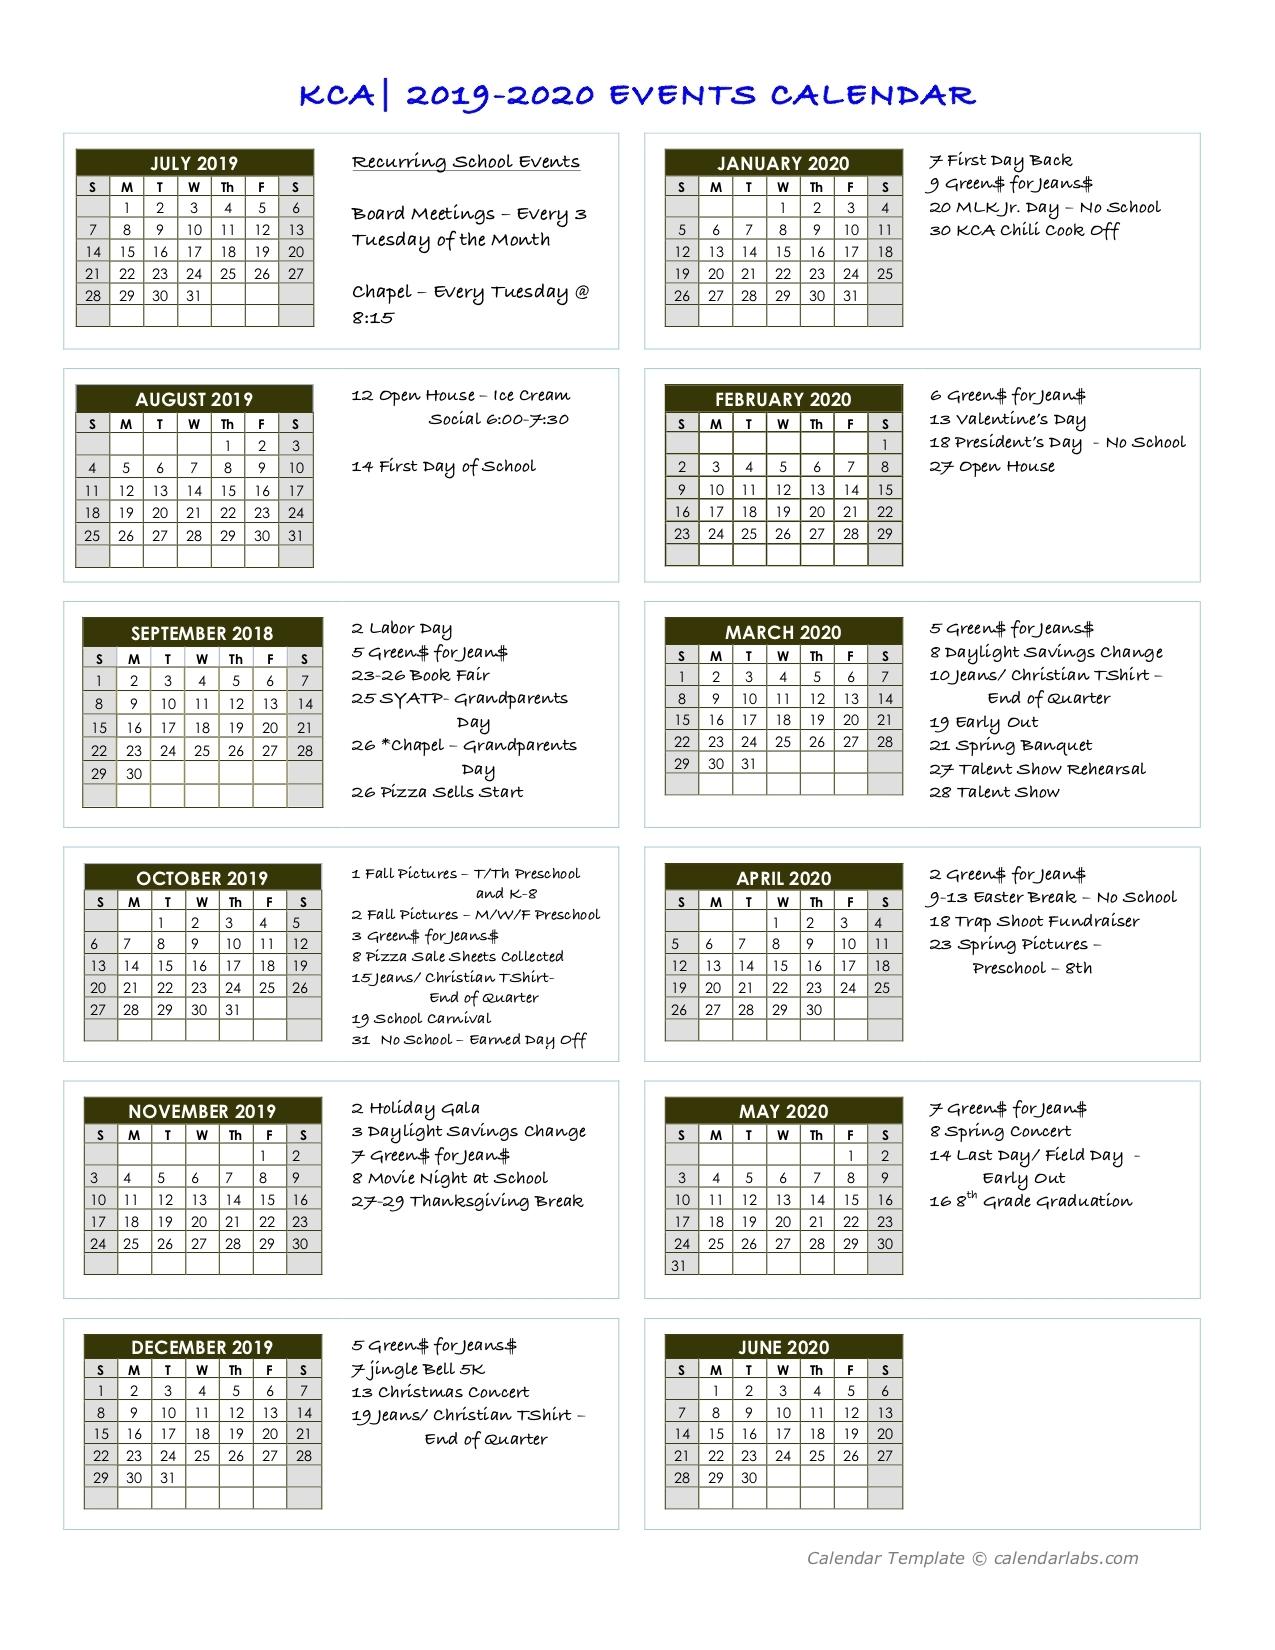 Kca| 2019-2020 Events Calendar